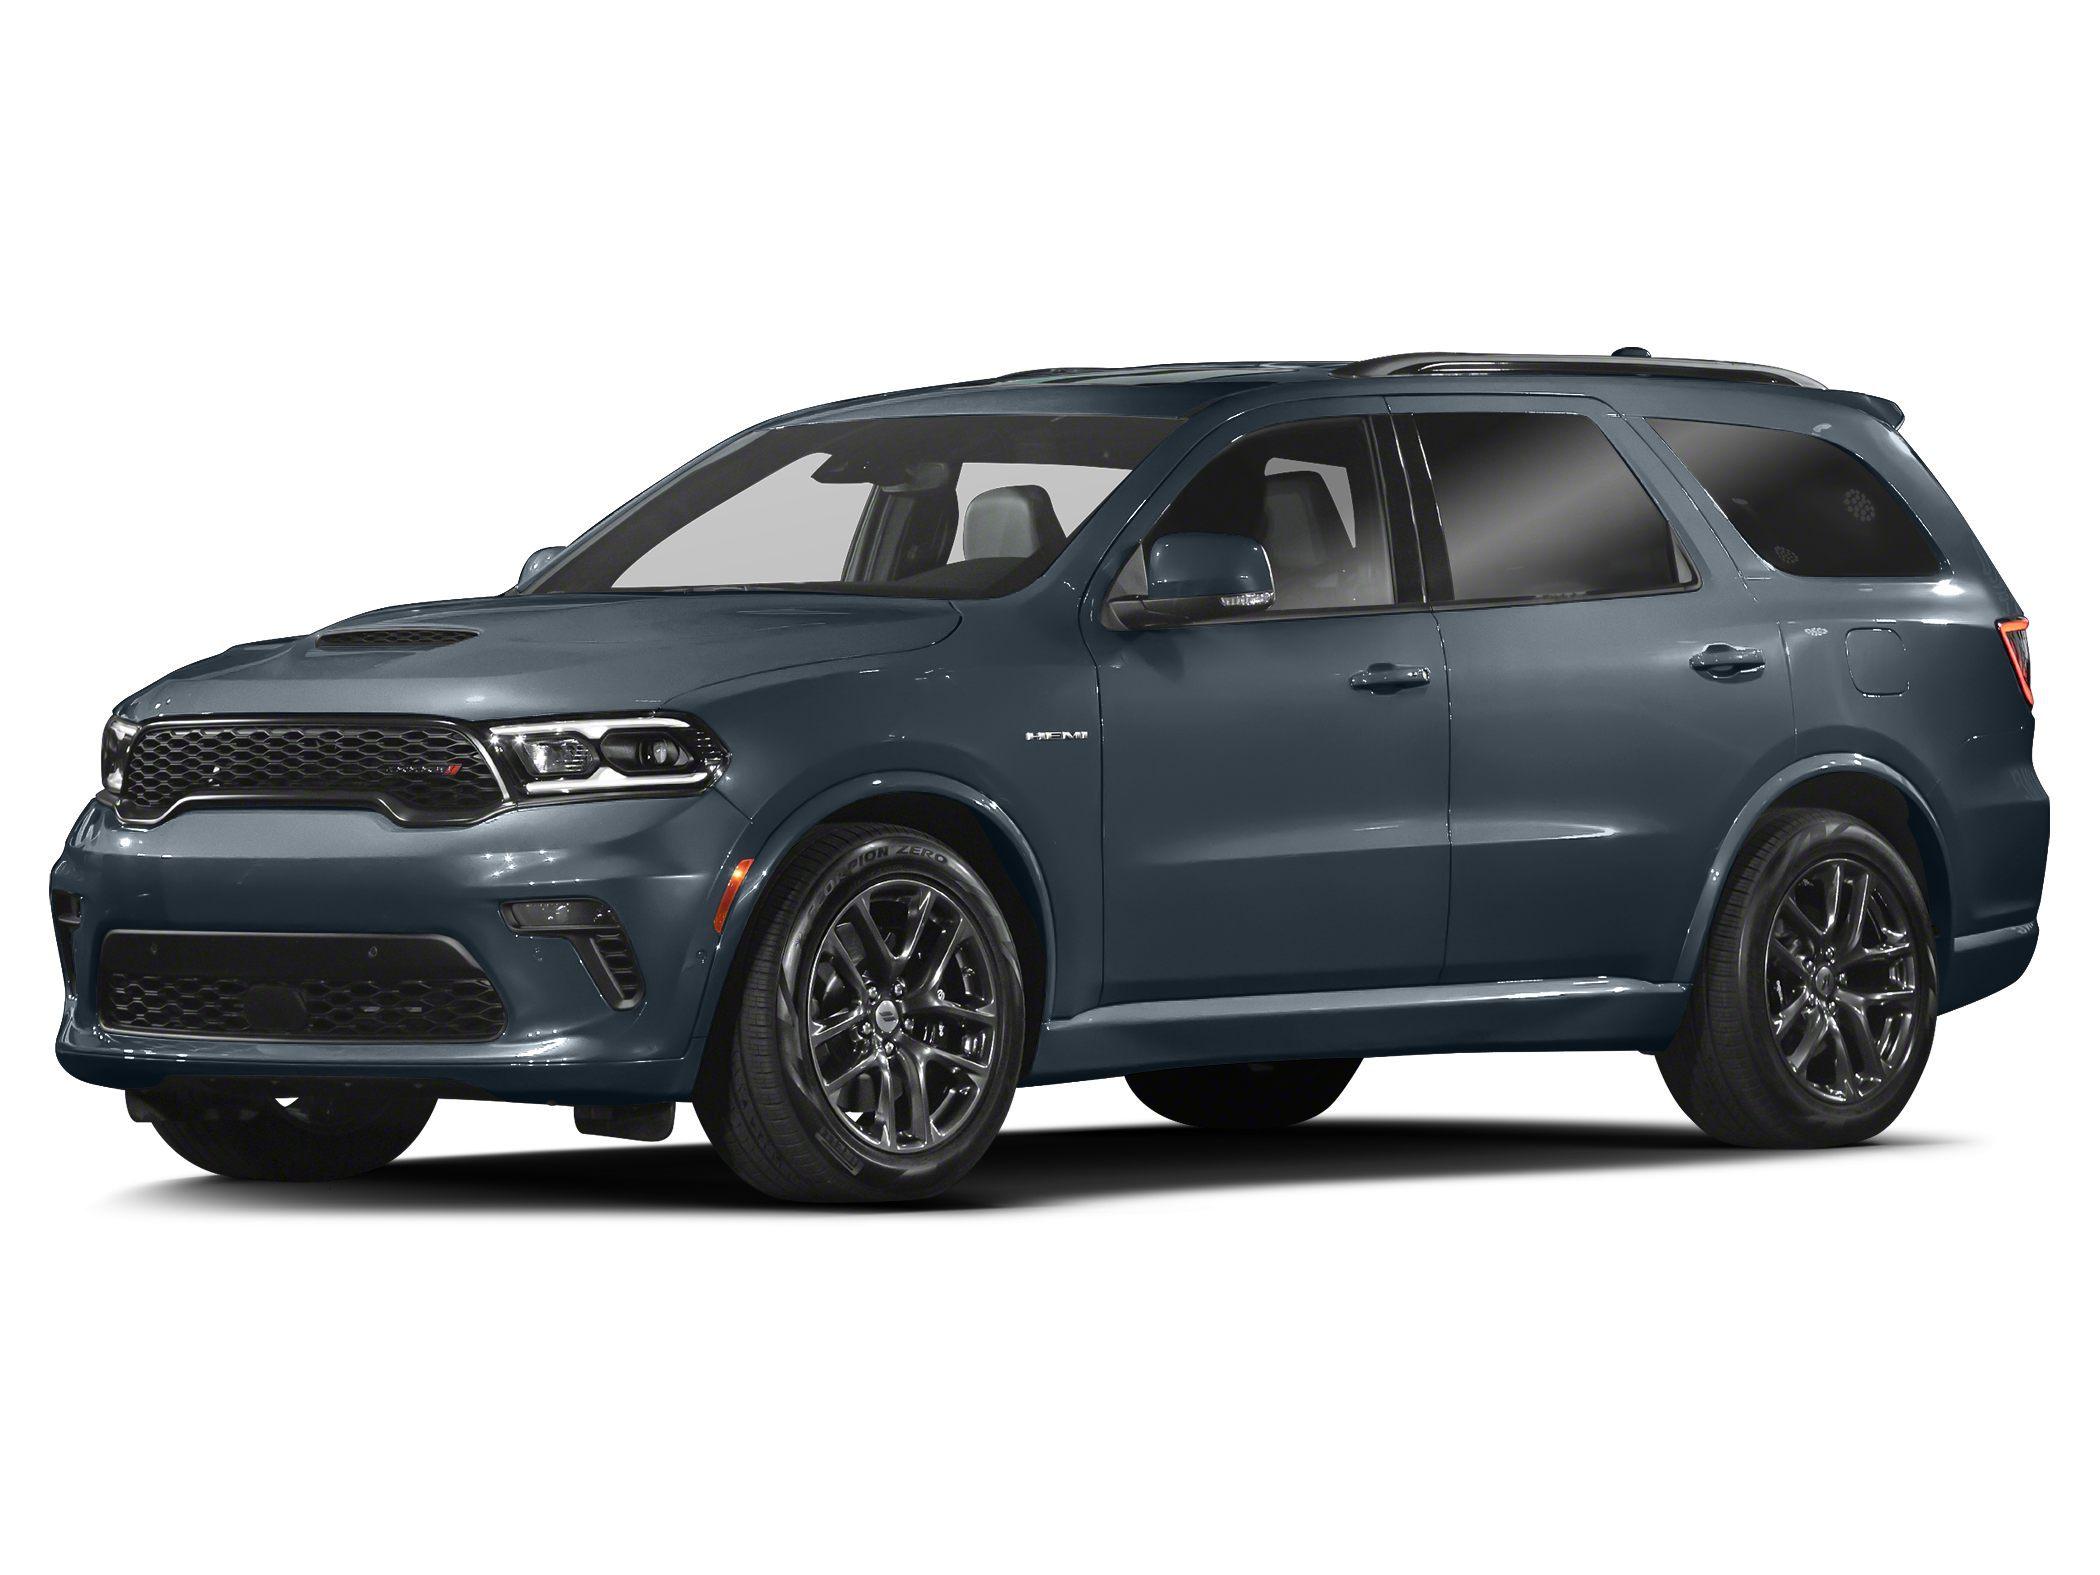 2021 Dodge Durango All-Wheel Drive